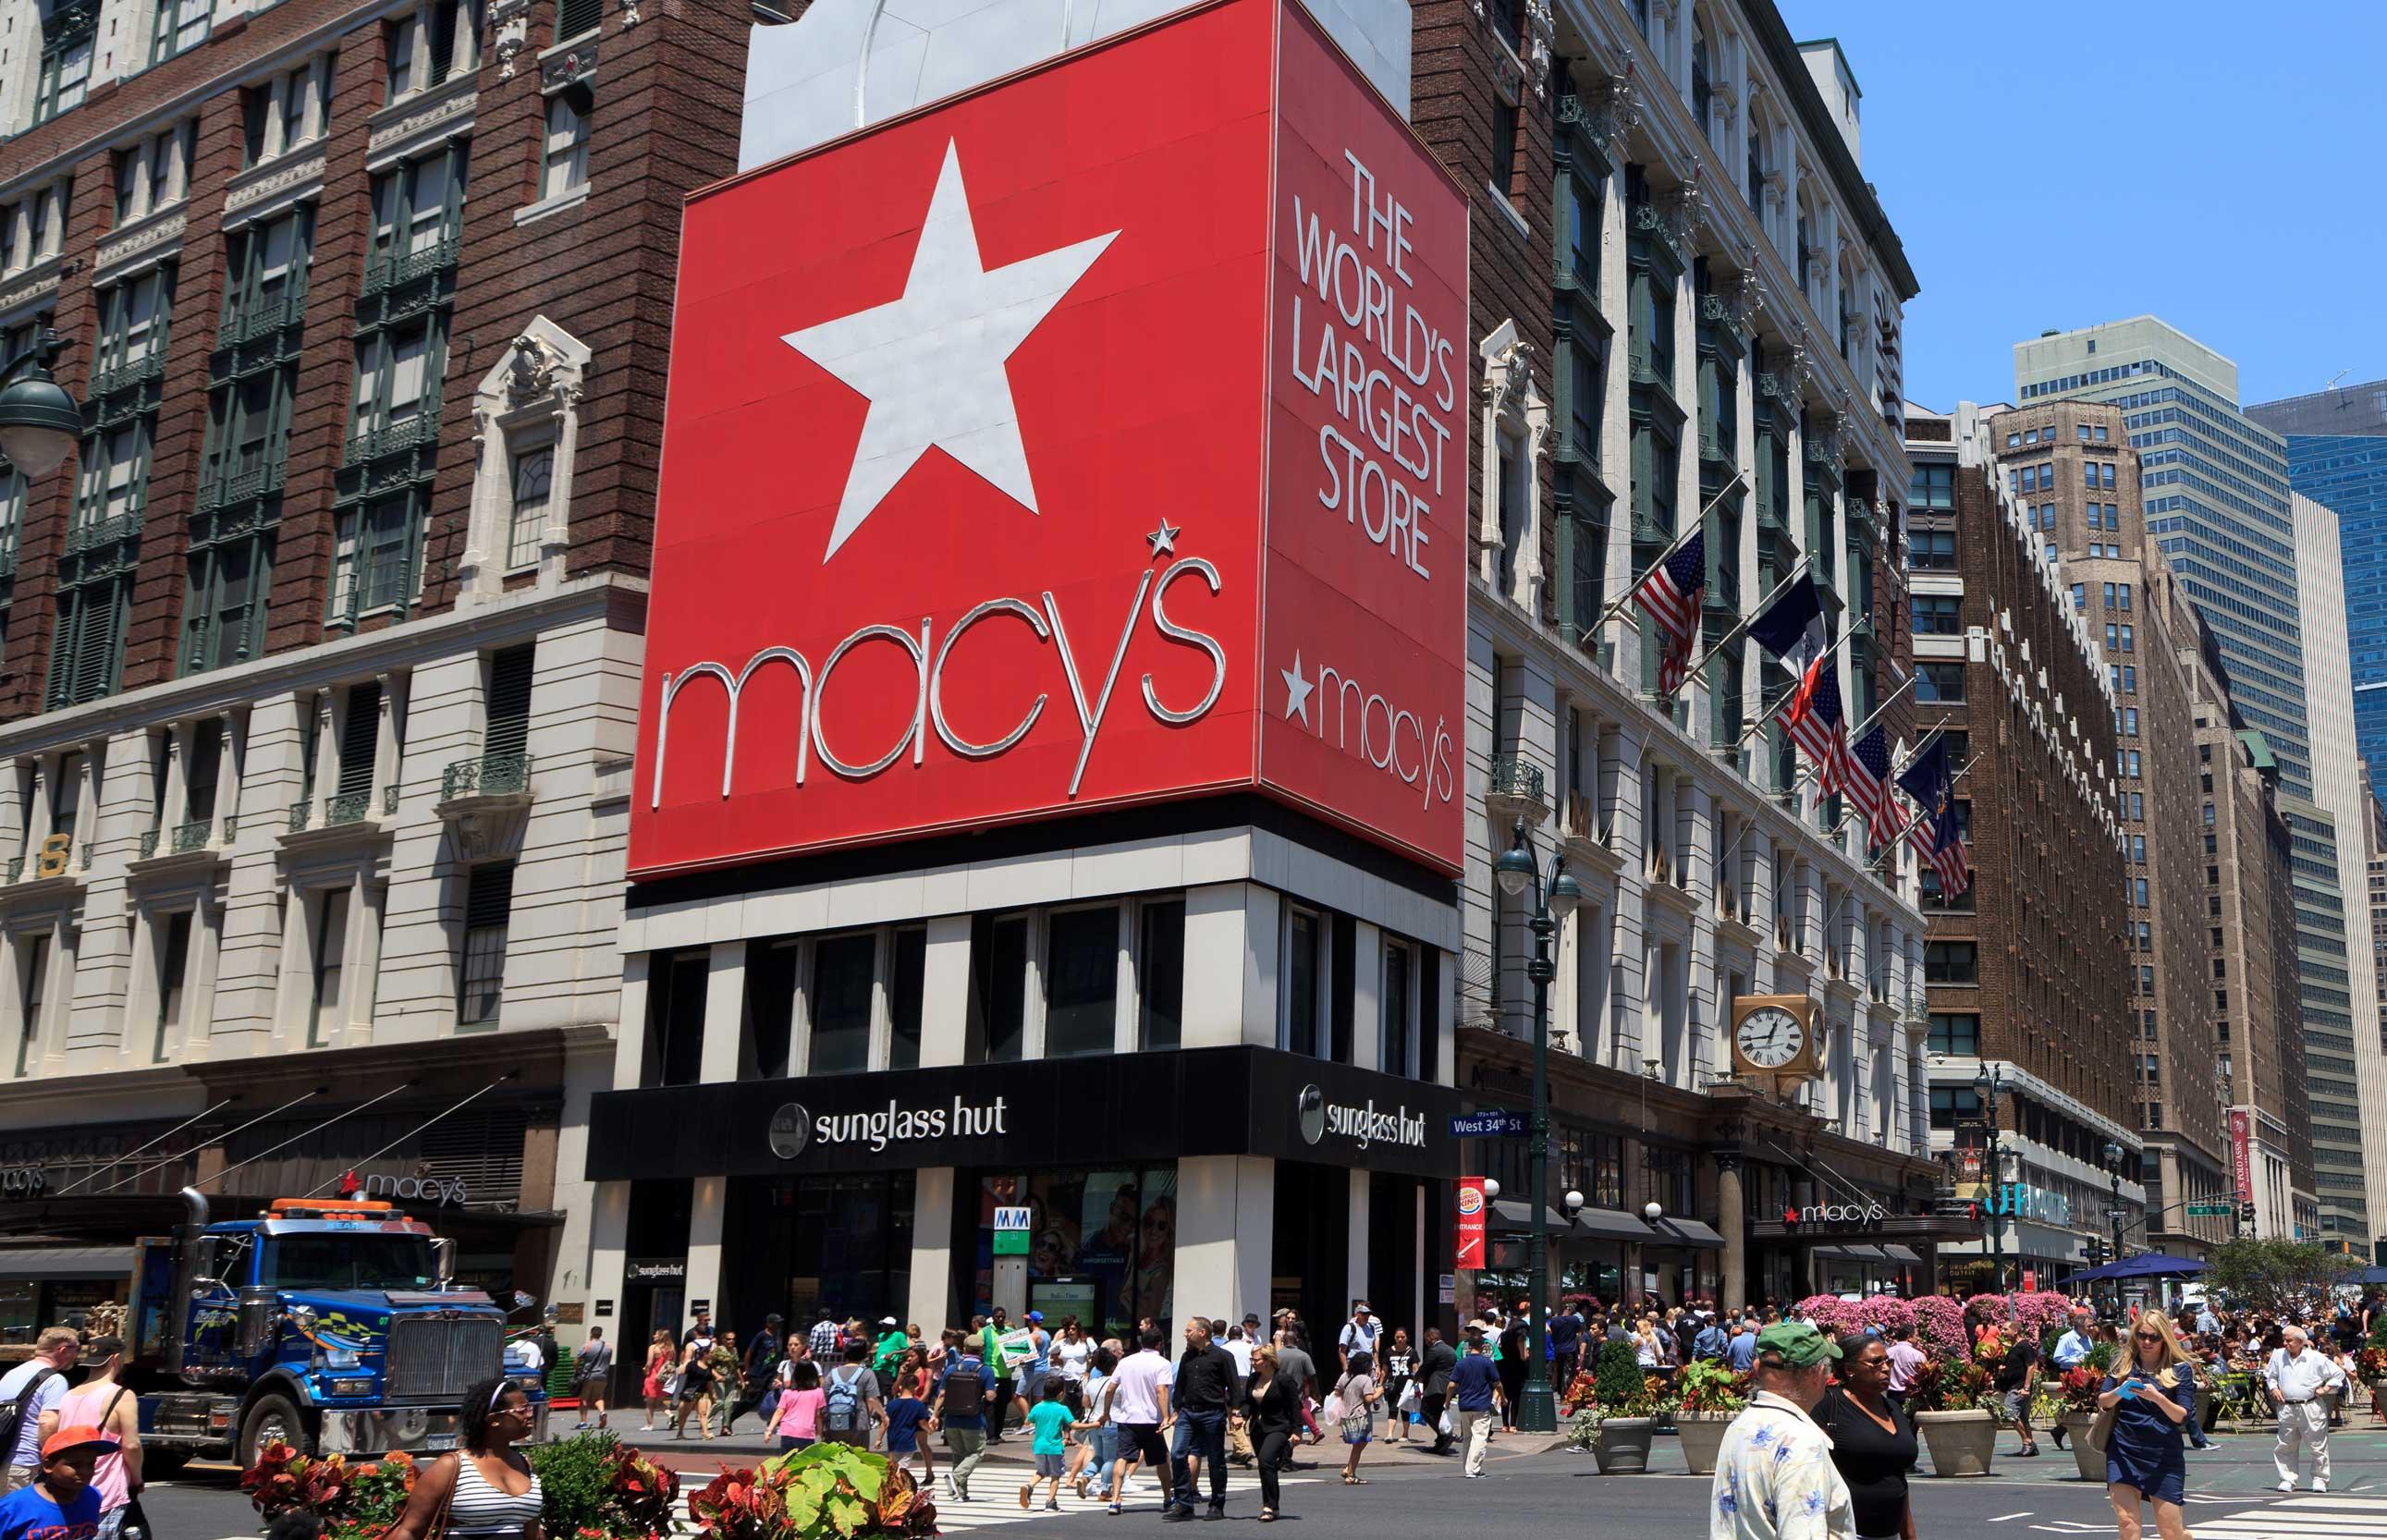 Bad Credit Auto Refinance >> 7 Ways to Save at Macy's | Credit.com